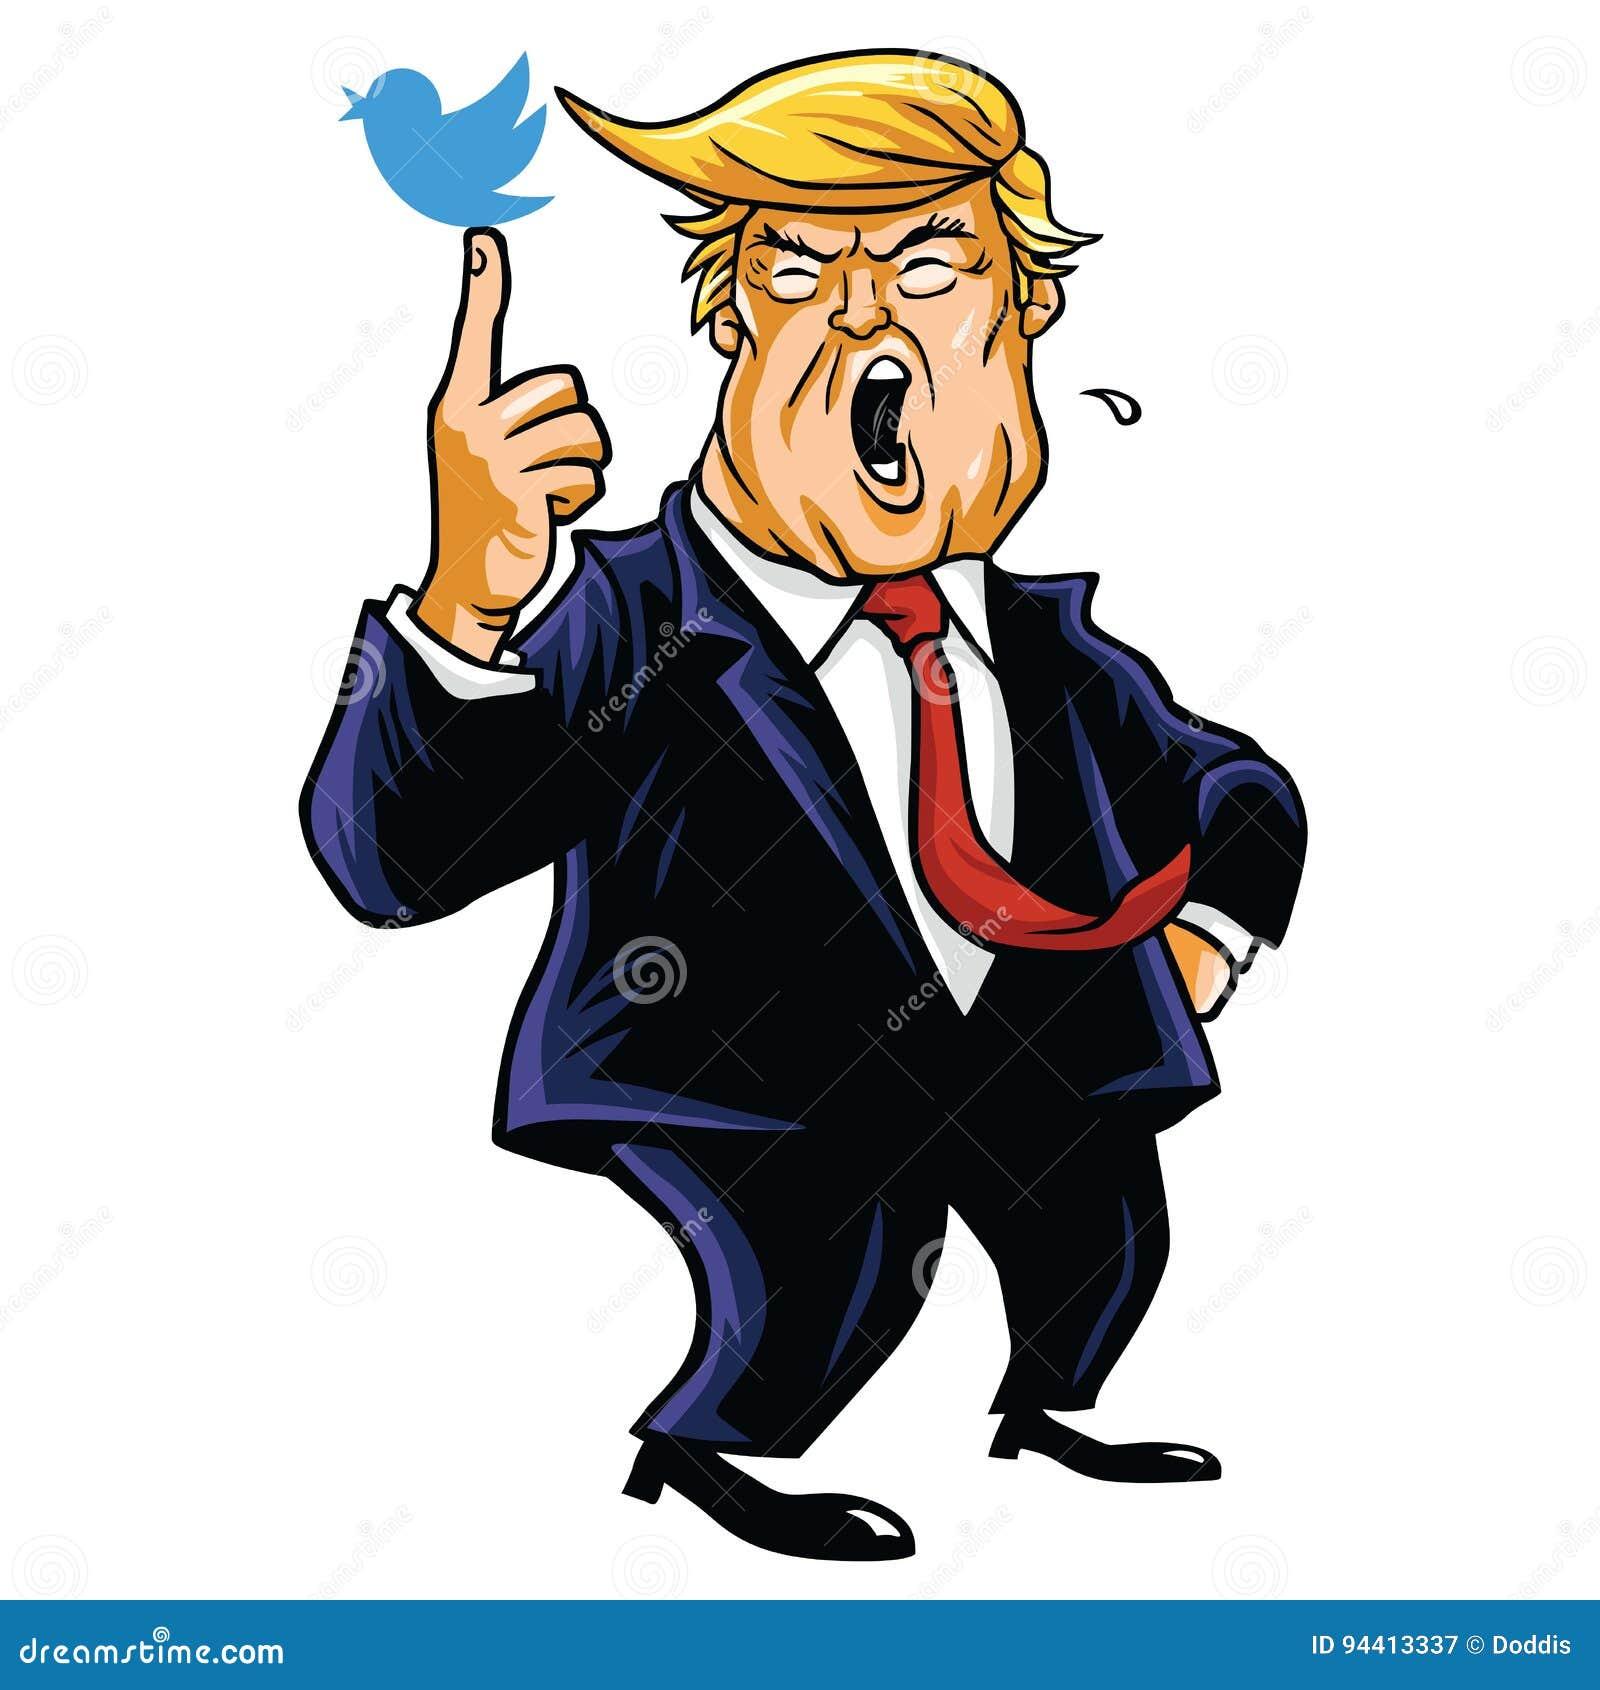 Donald Trump With His Blue Bird Cartoon Vector Illustration June